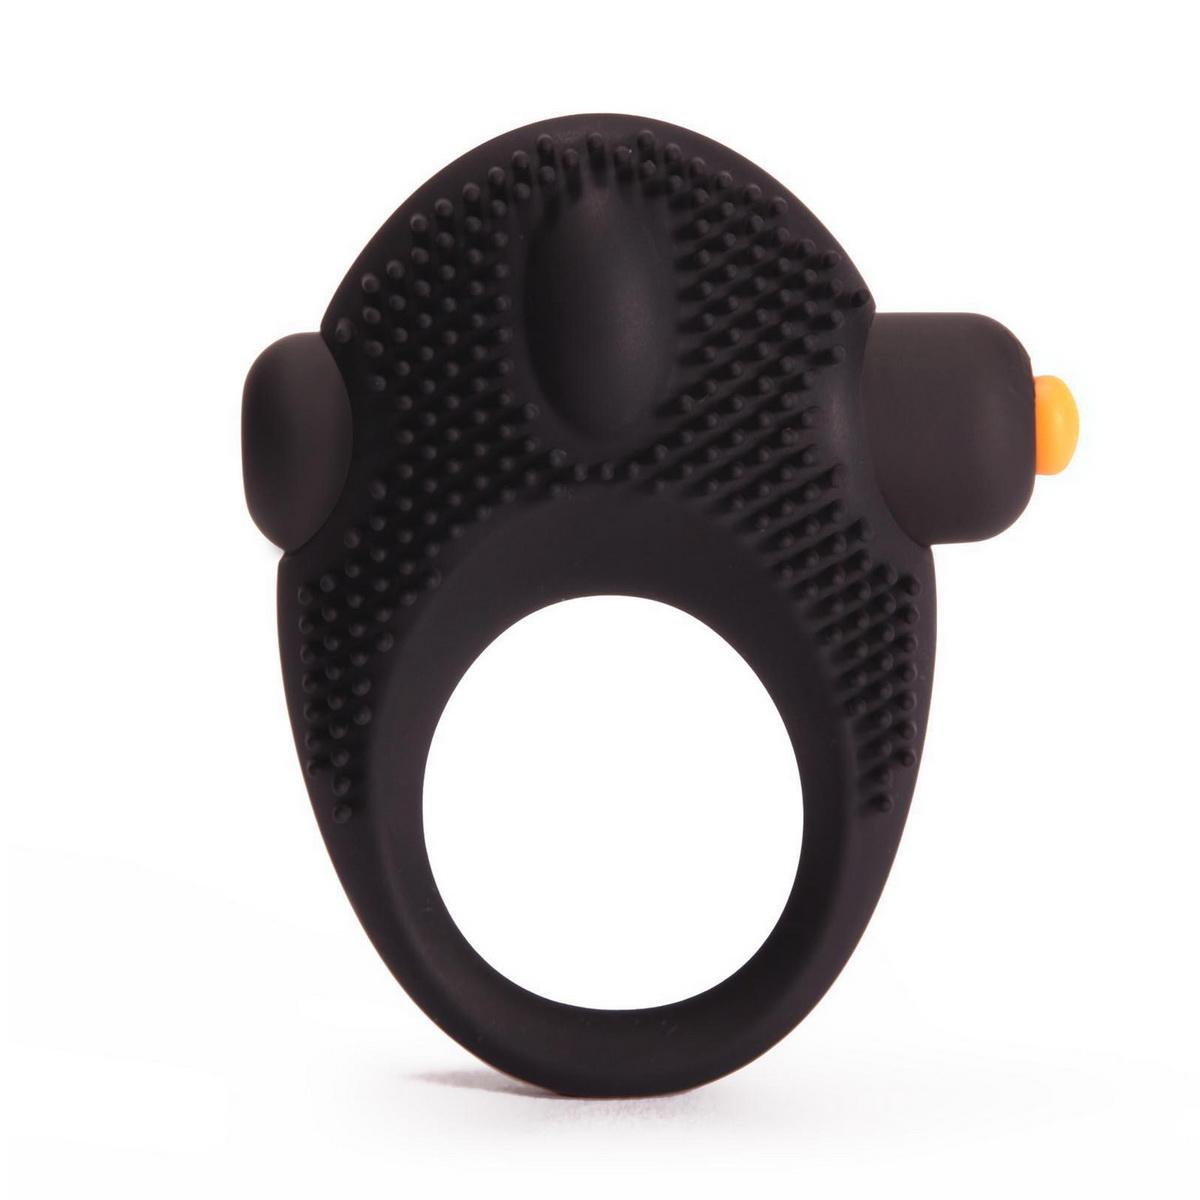 Kroužek Pornhub - Vibrating Cock Ring